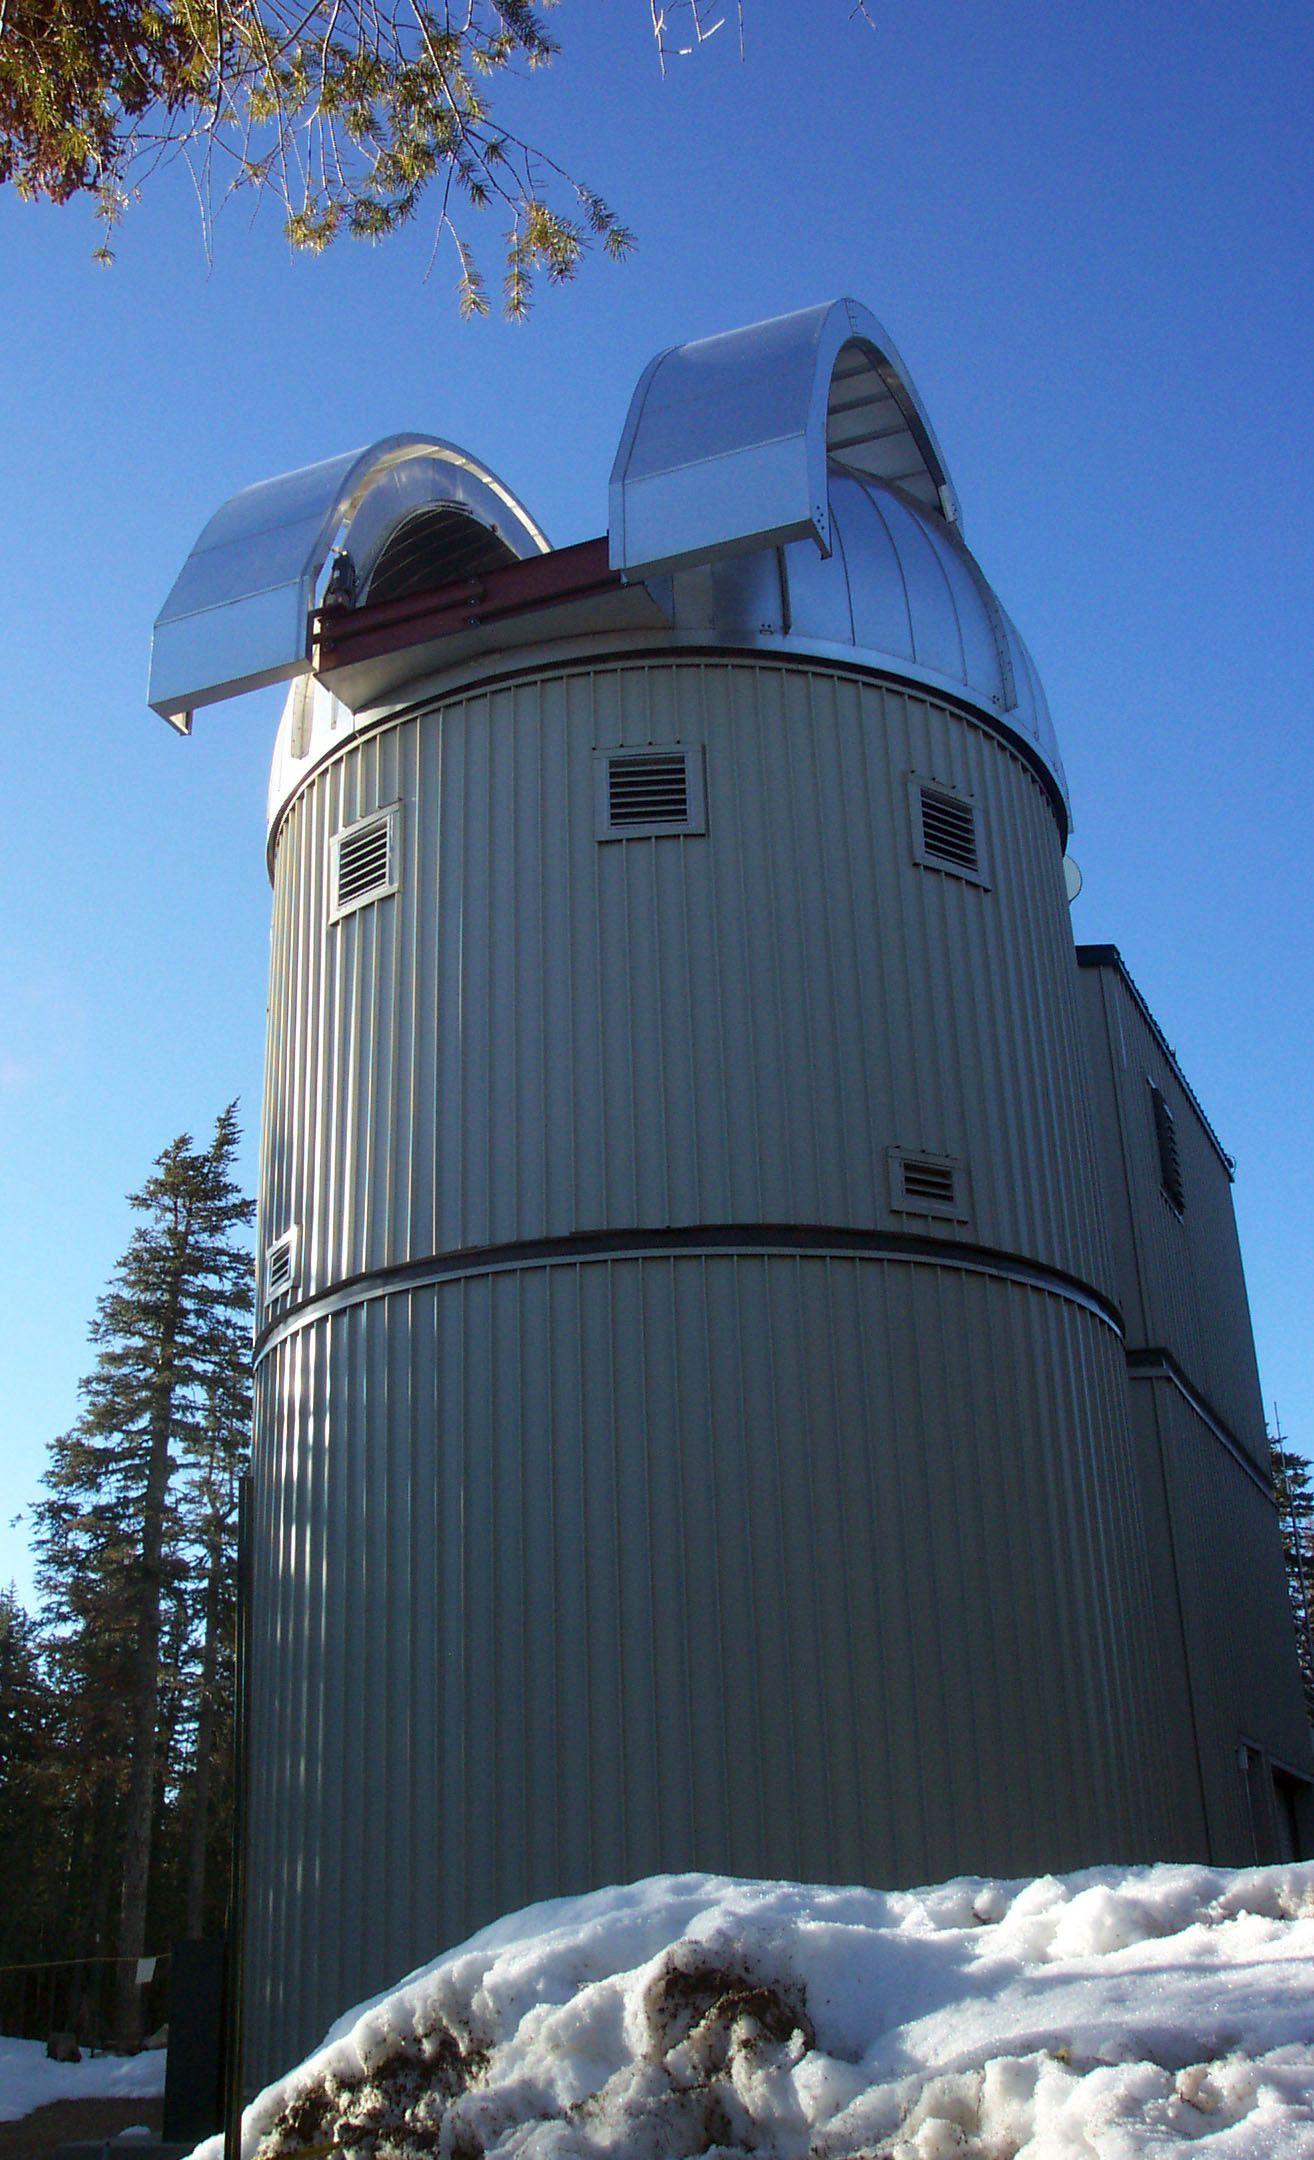 Vatican Advanced Technology Telescope (VATT) in Winter